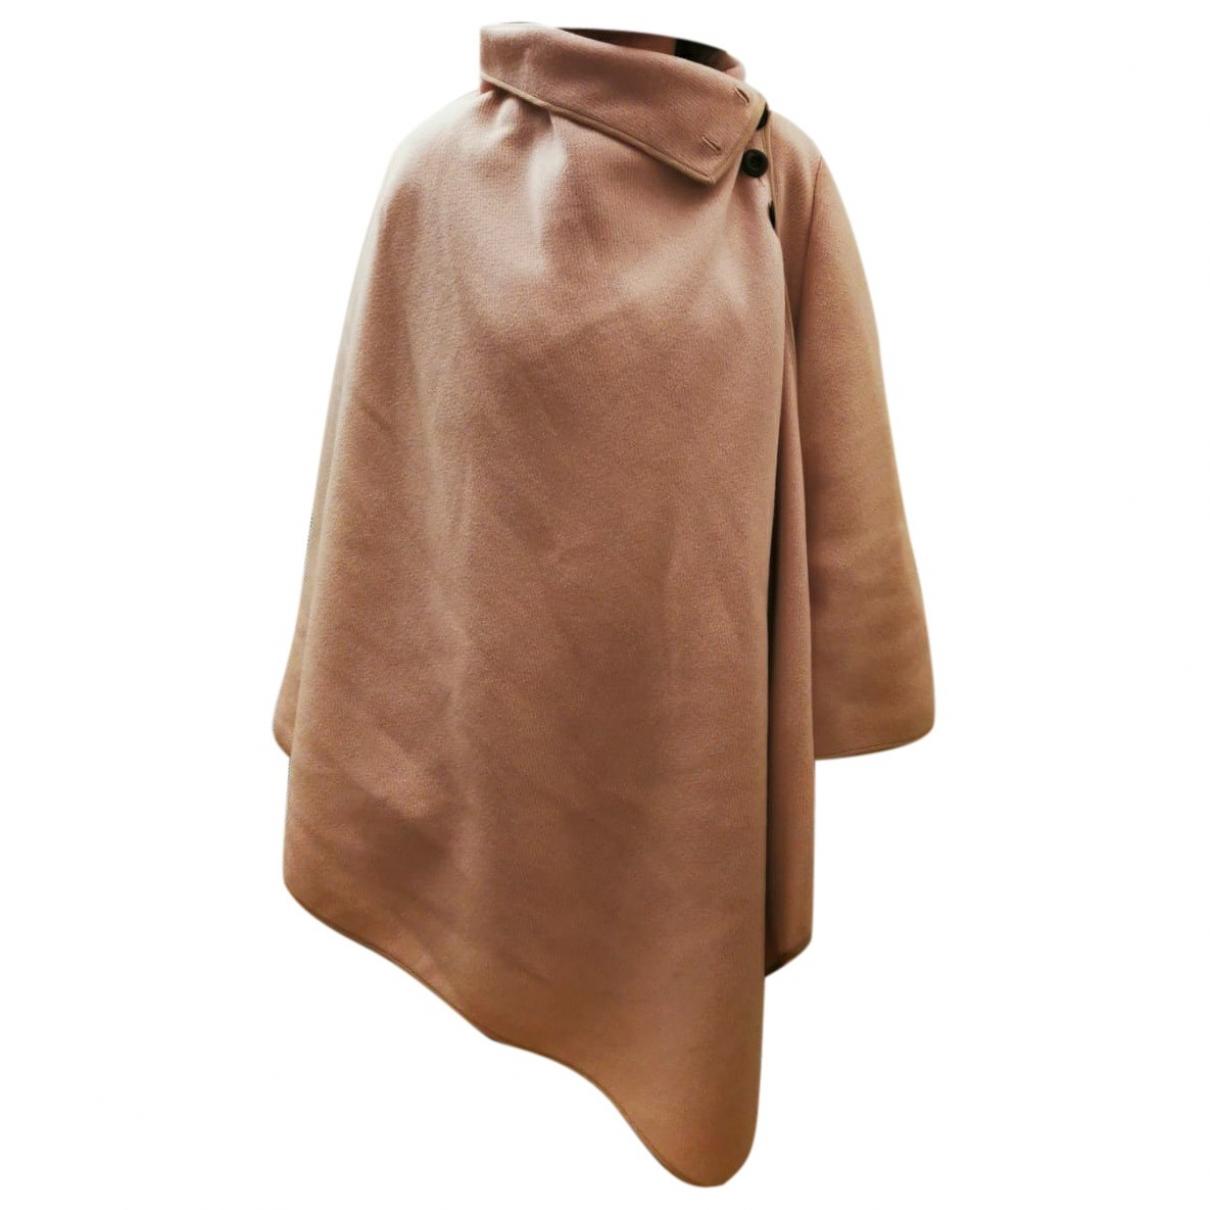 Chloé \N Pink Wool jacket for Women 36 FR